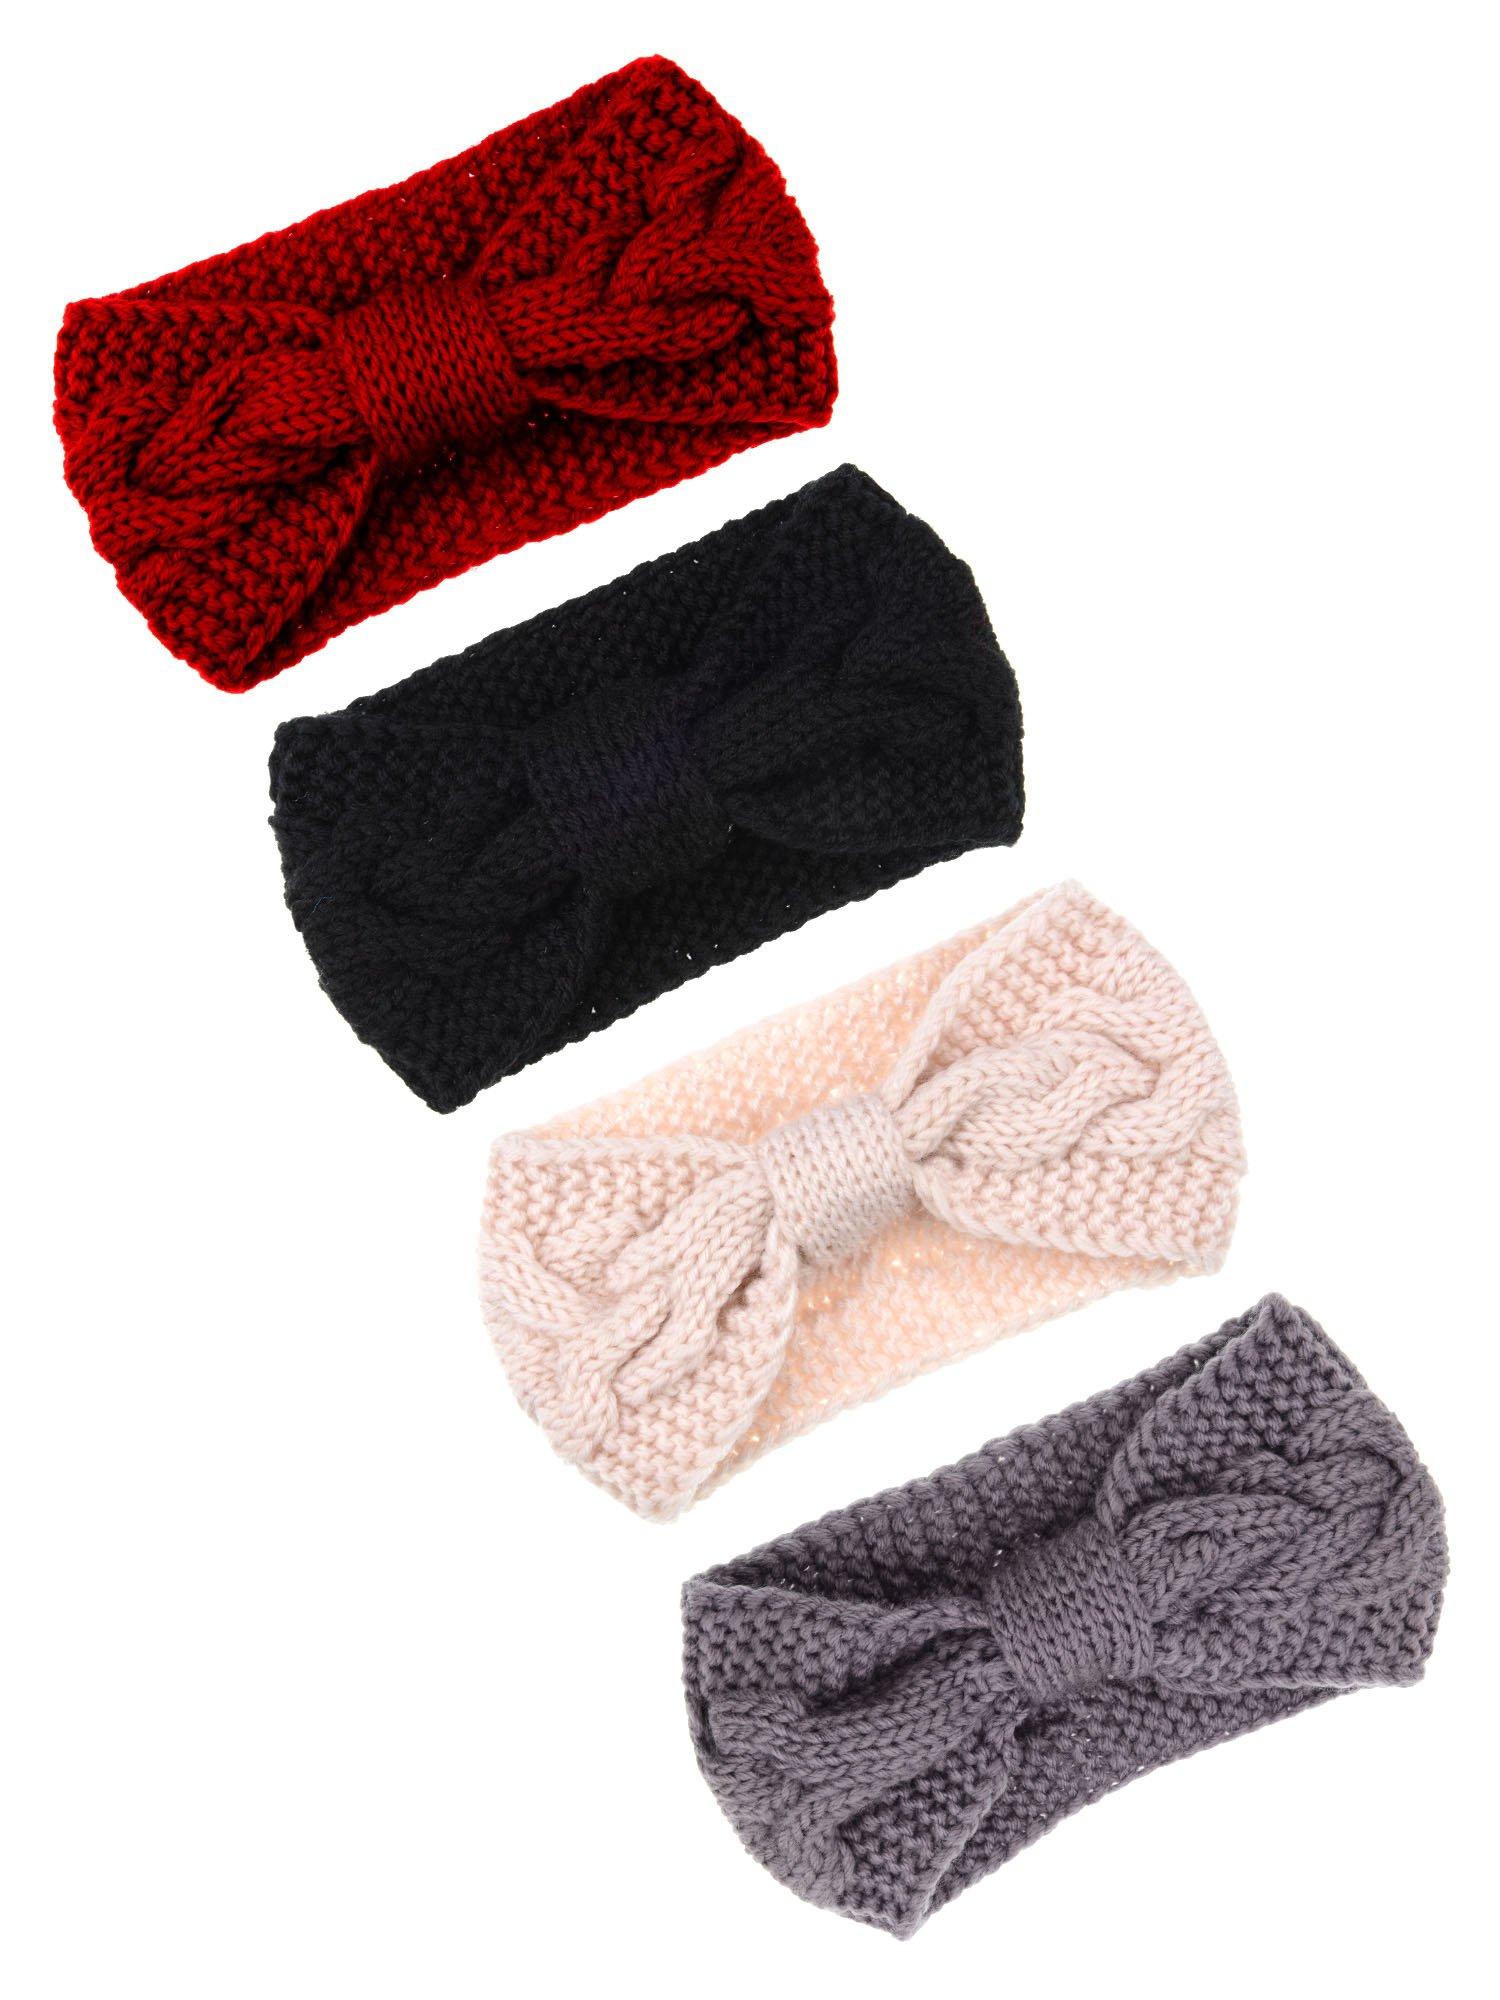 Pangda 4 Pieces Cable Knit Headband Crochet Headbands Plain Braided Head Wrap Winter Ear Warmer for Women Girls, 4 Colors (Multicoloured A)